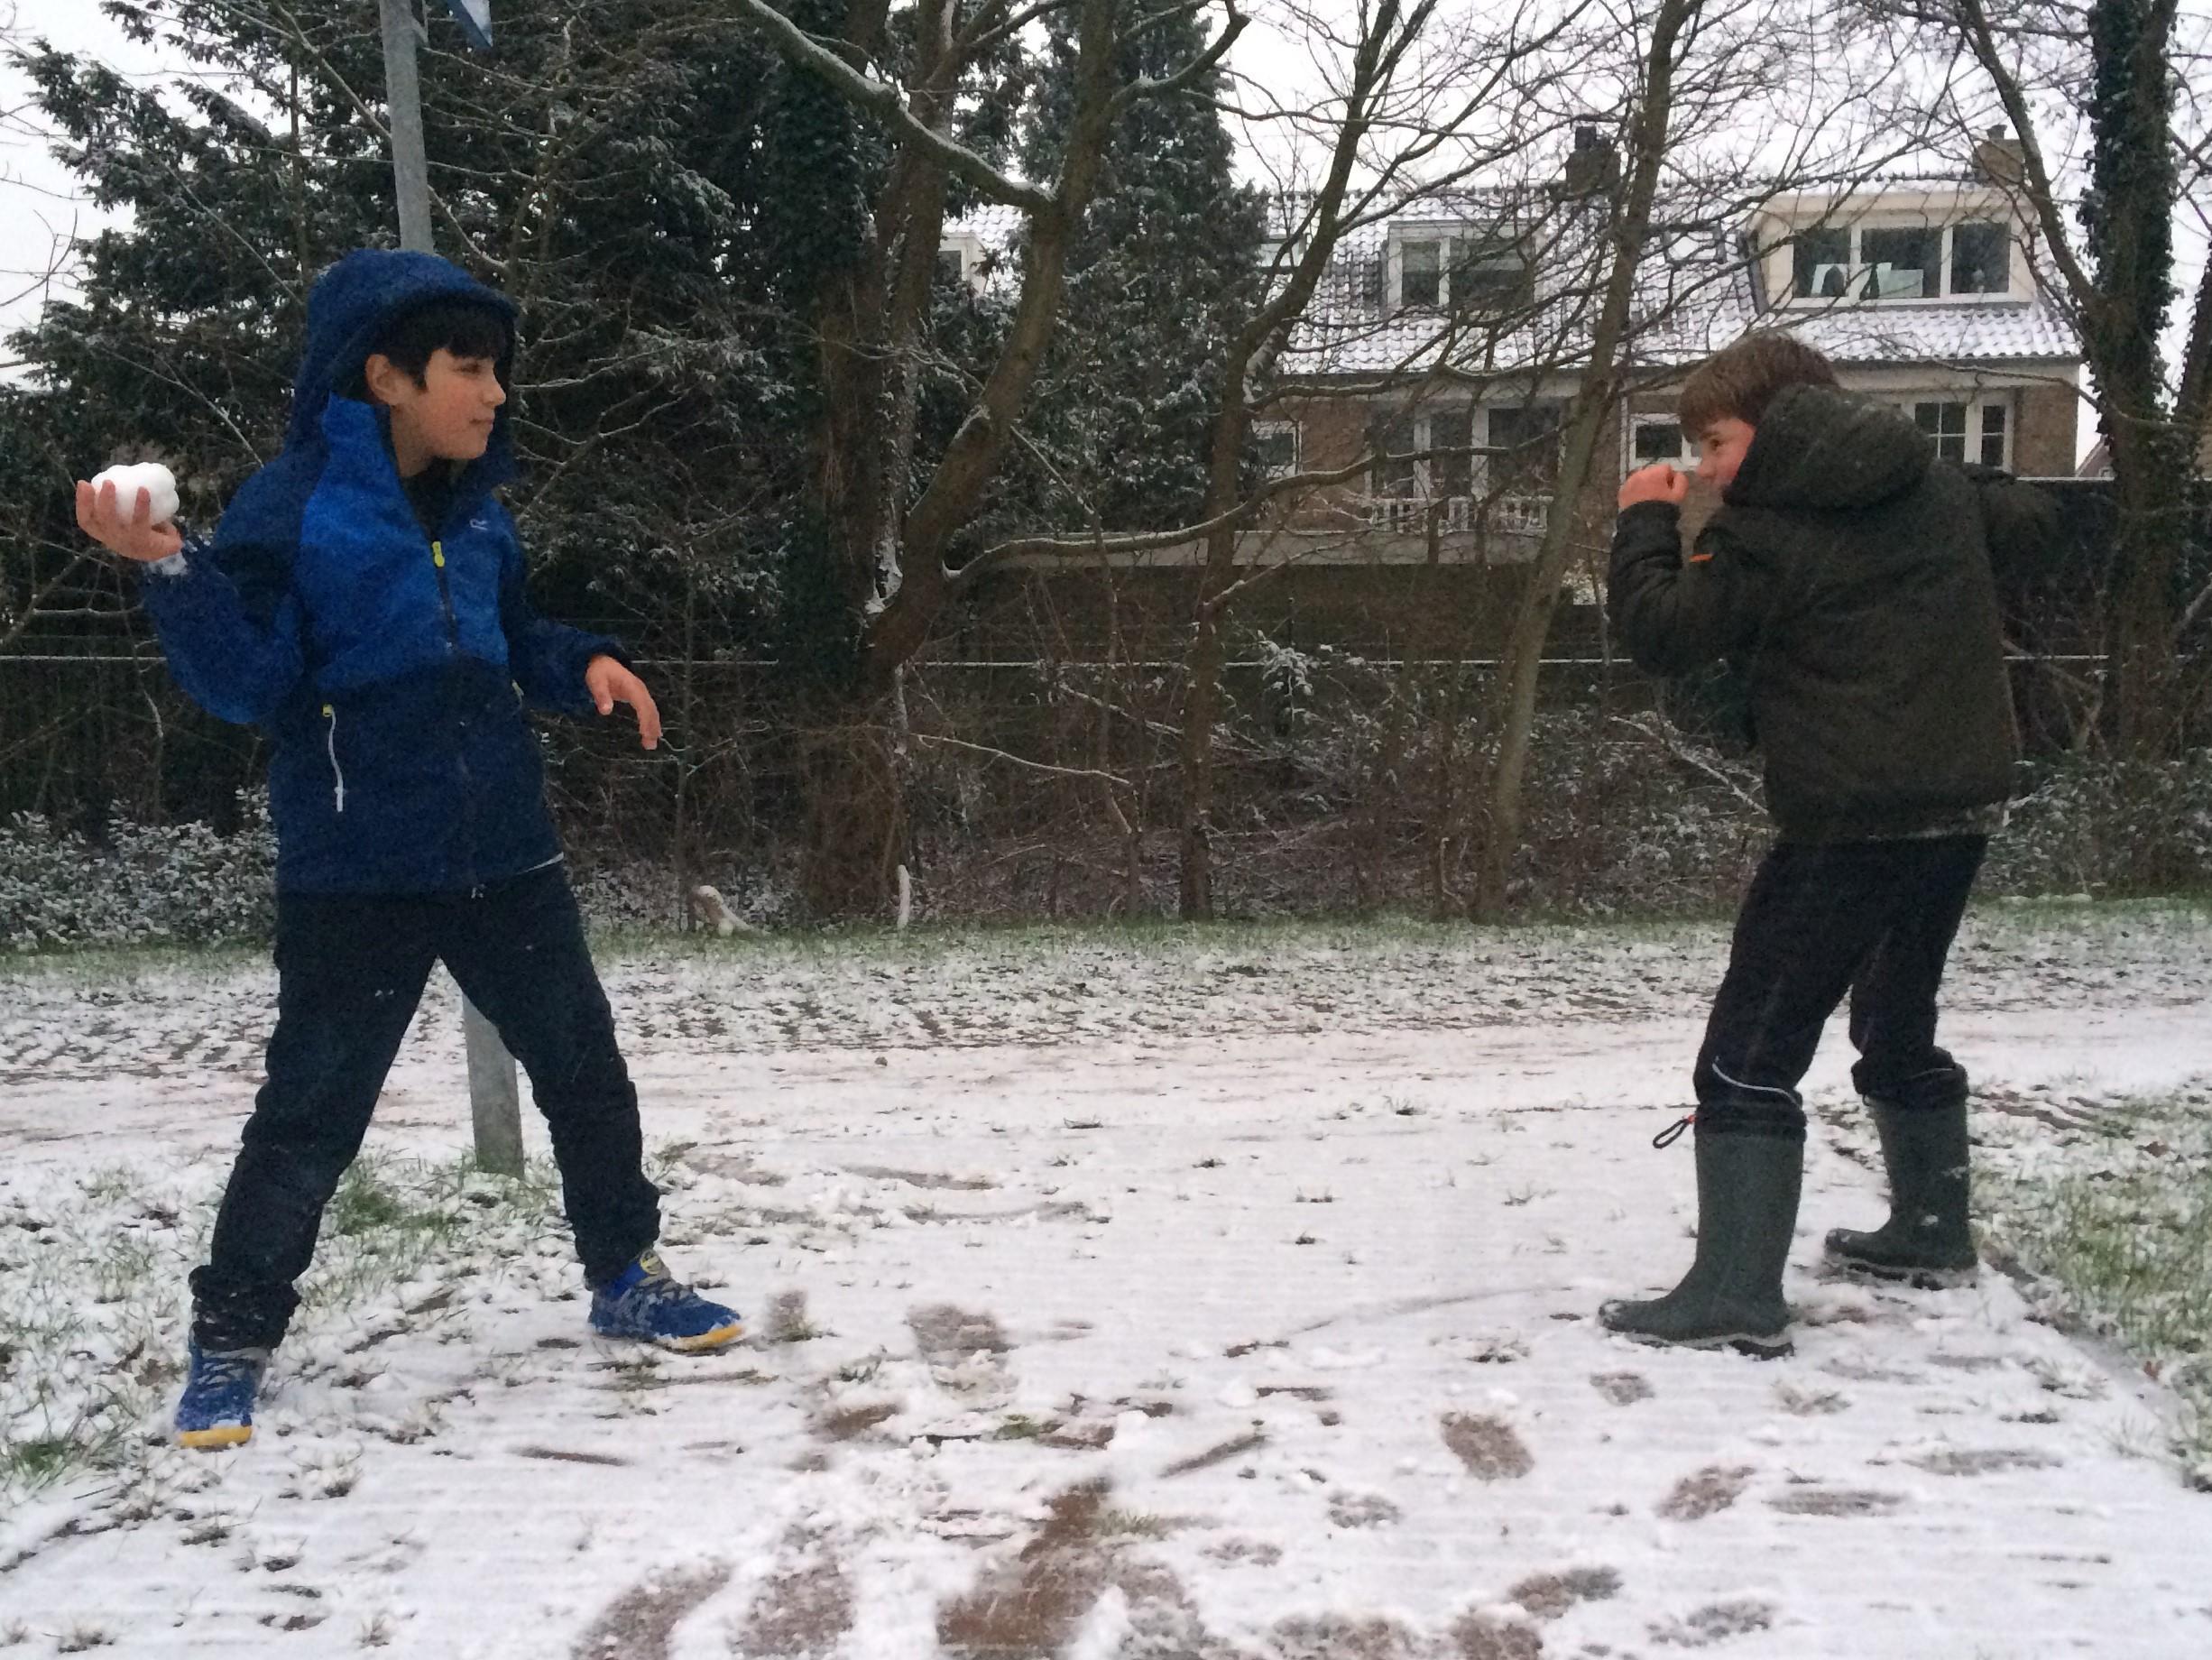 Sneeuwpret als Velsen zaterdag langzaam helemaal wit kleurt